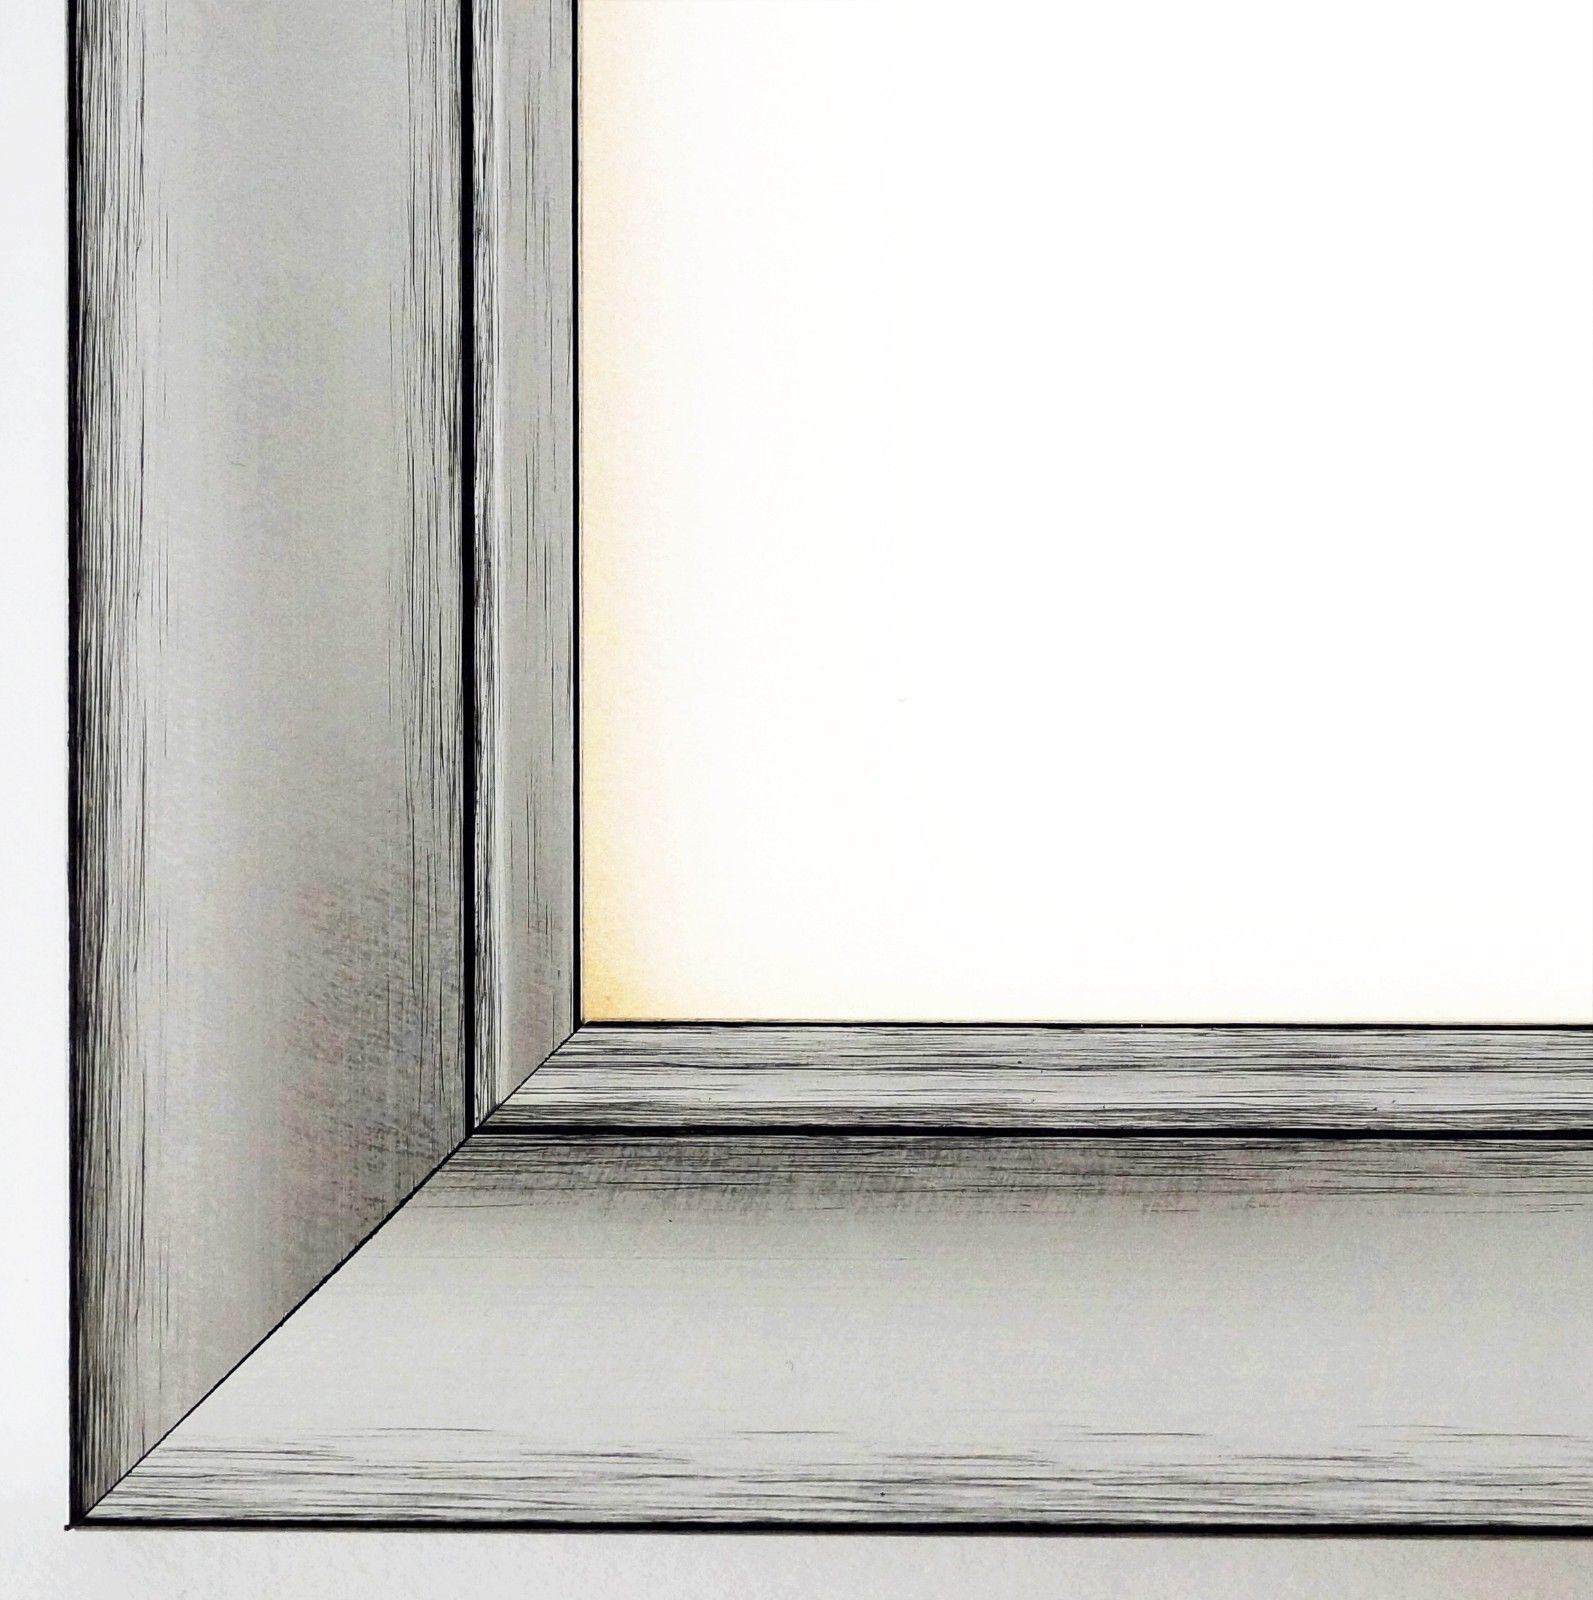 Bilderrahmen Silber Dortmund - 9x13 10x10 10x15 13x18 15x20 18x24 ...